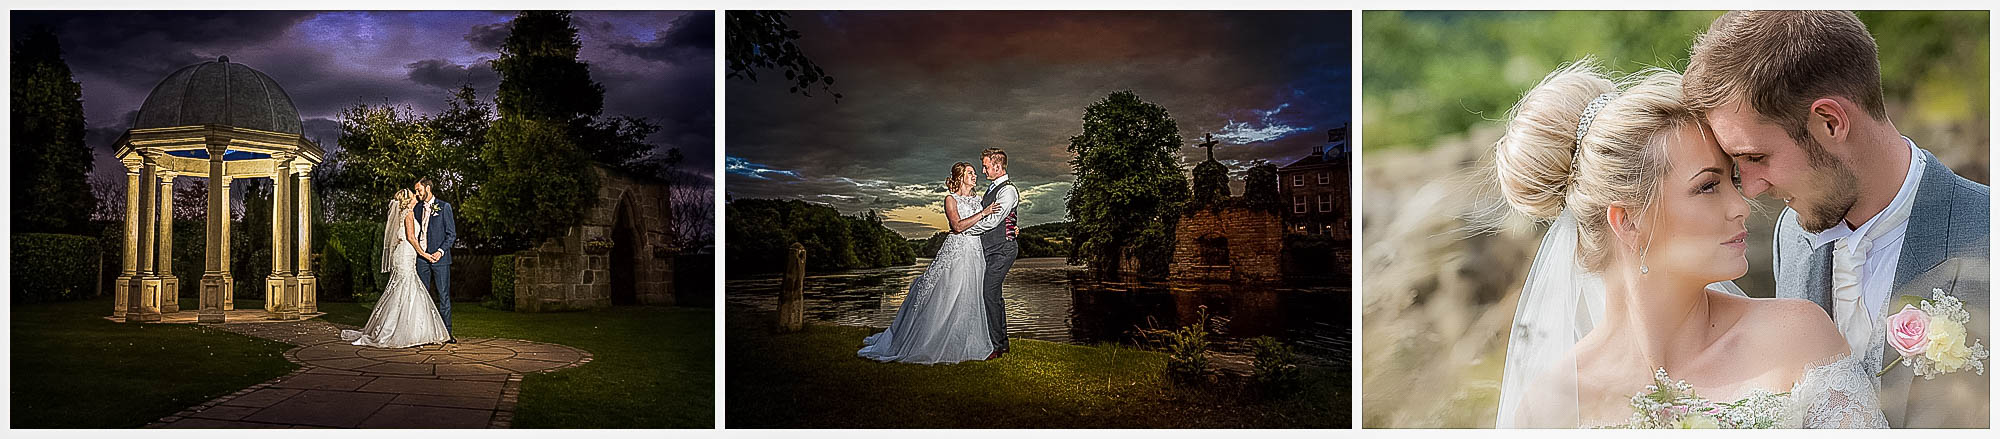 Castleford Wedding Photographer